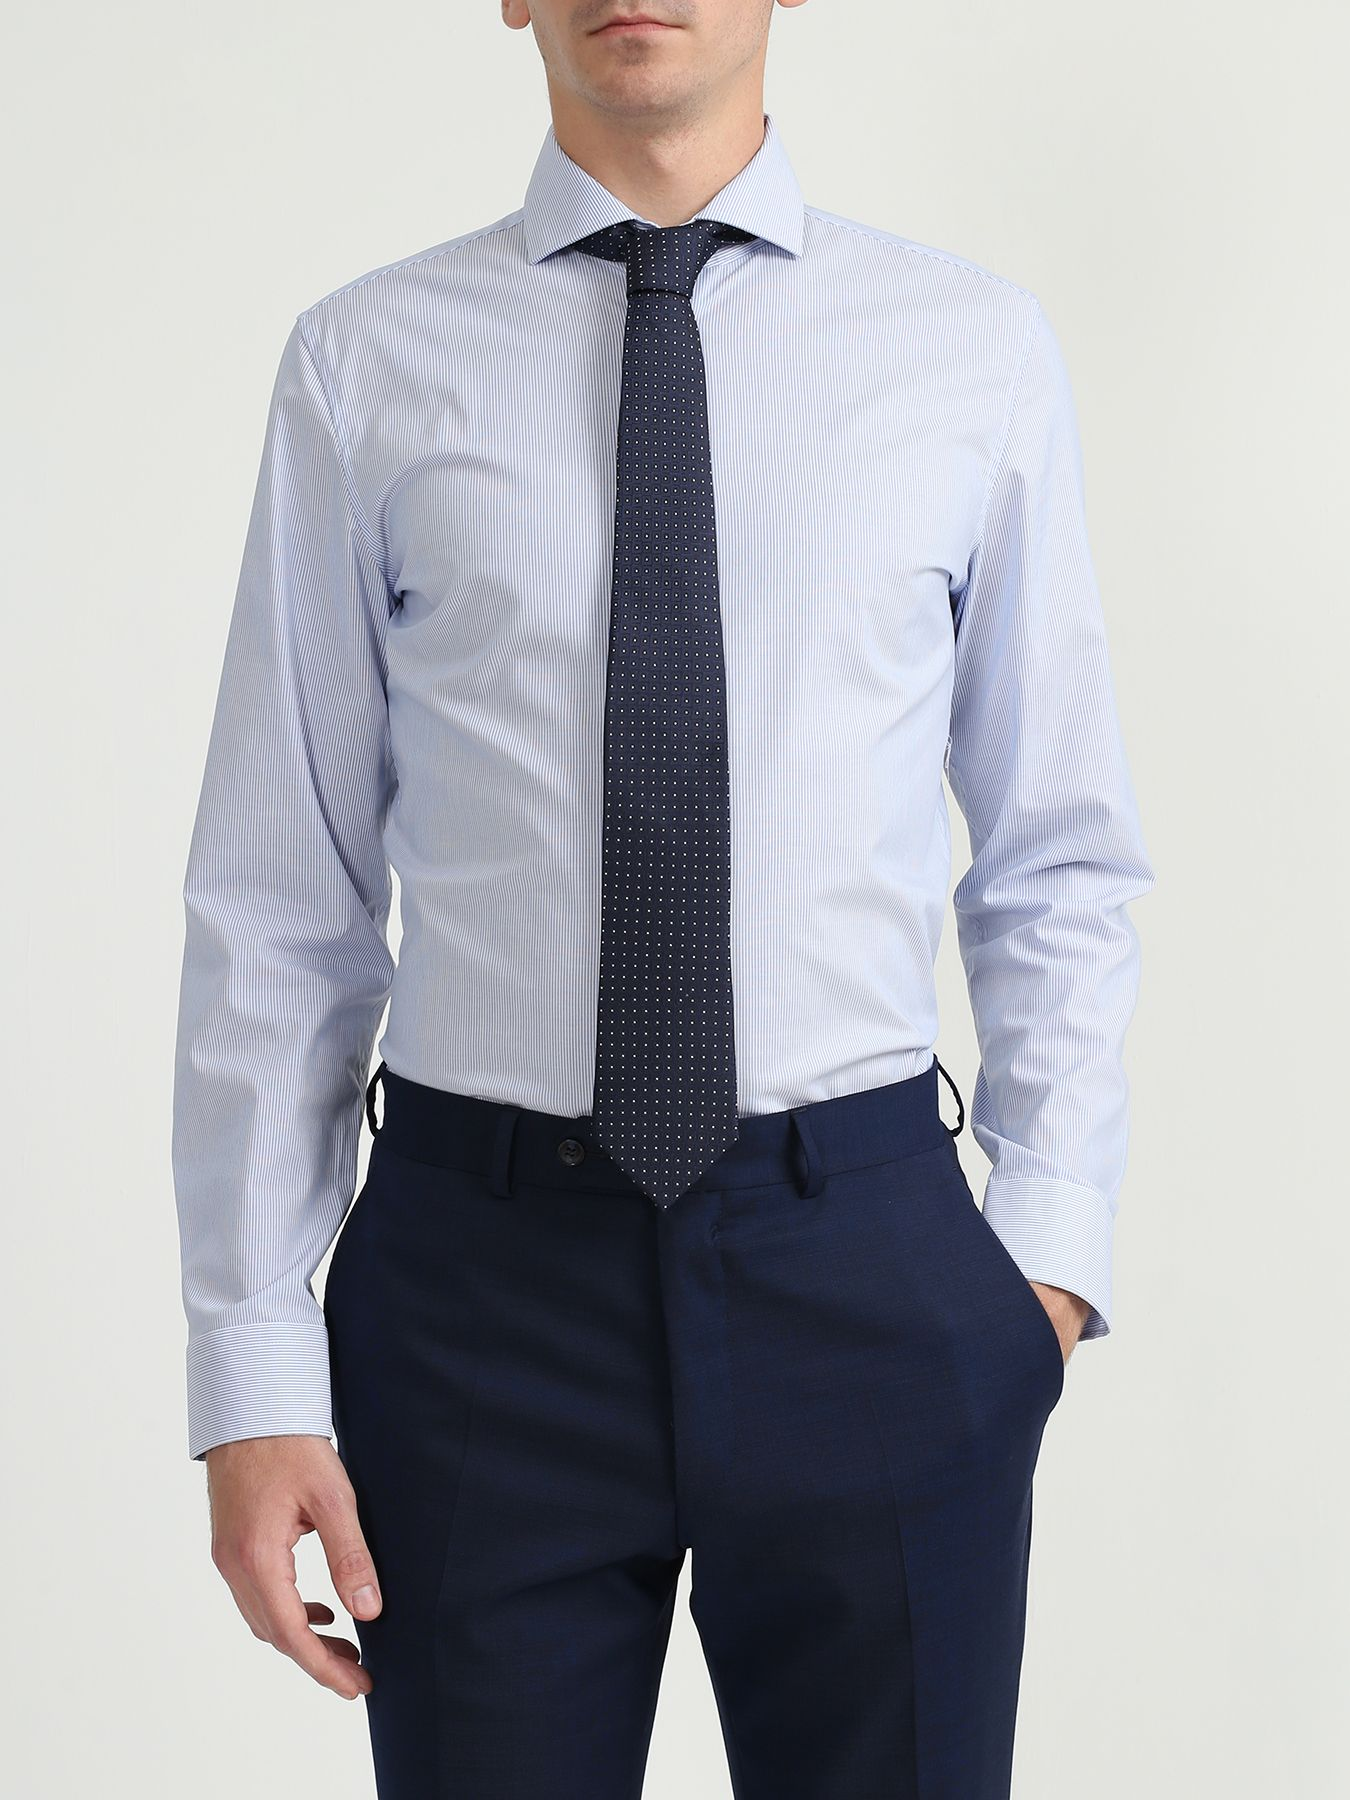 Alessandro Manzoni Шелковый галстук с узорами 324190-185